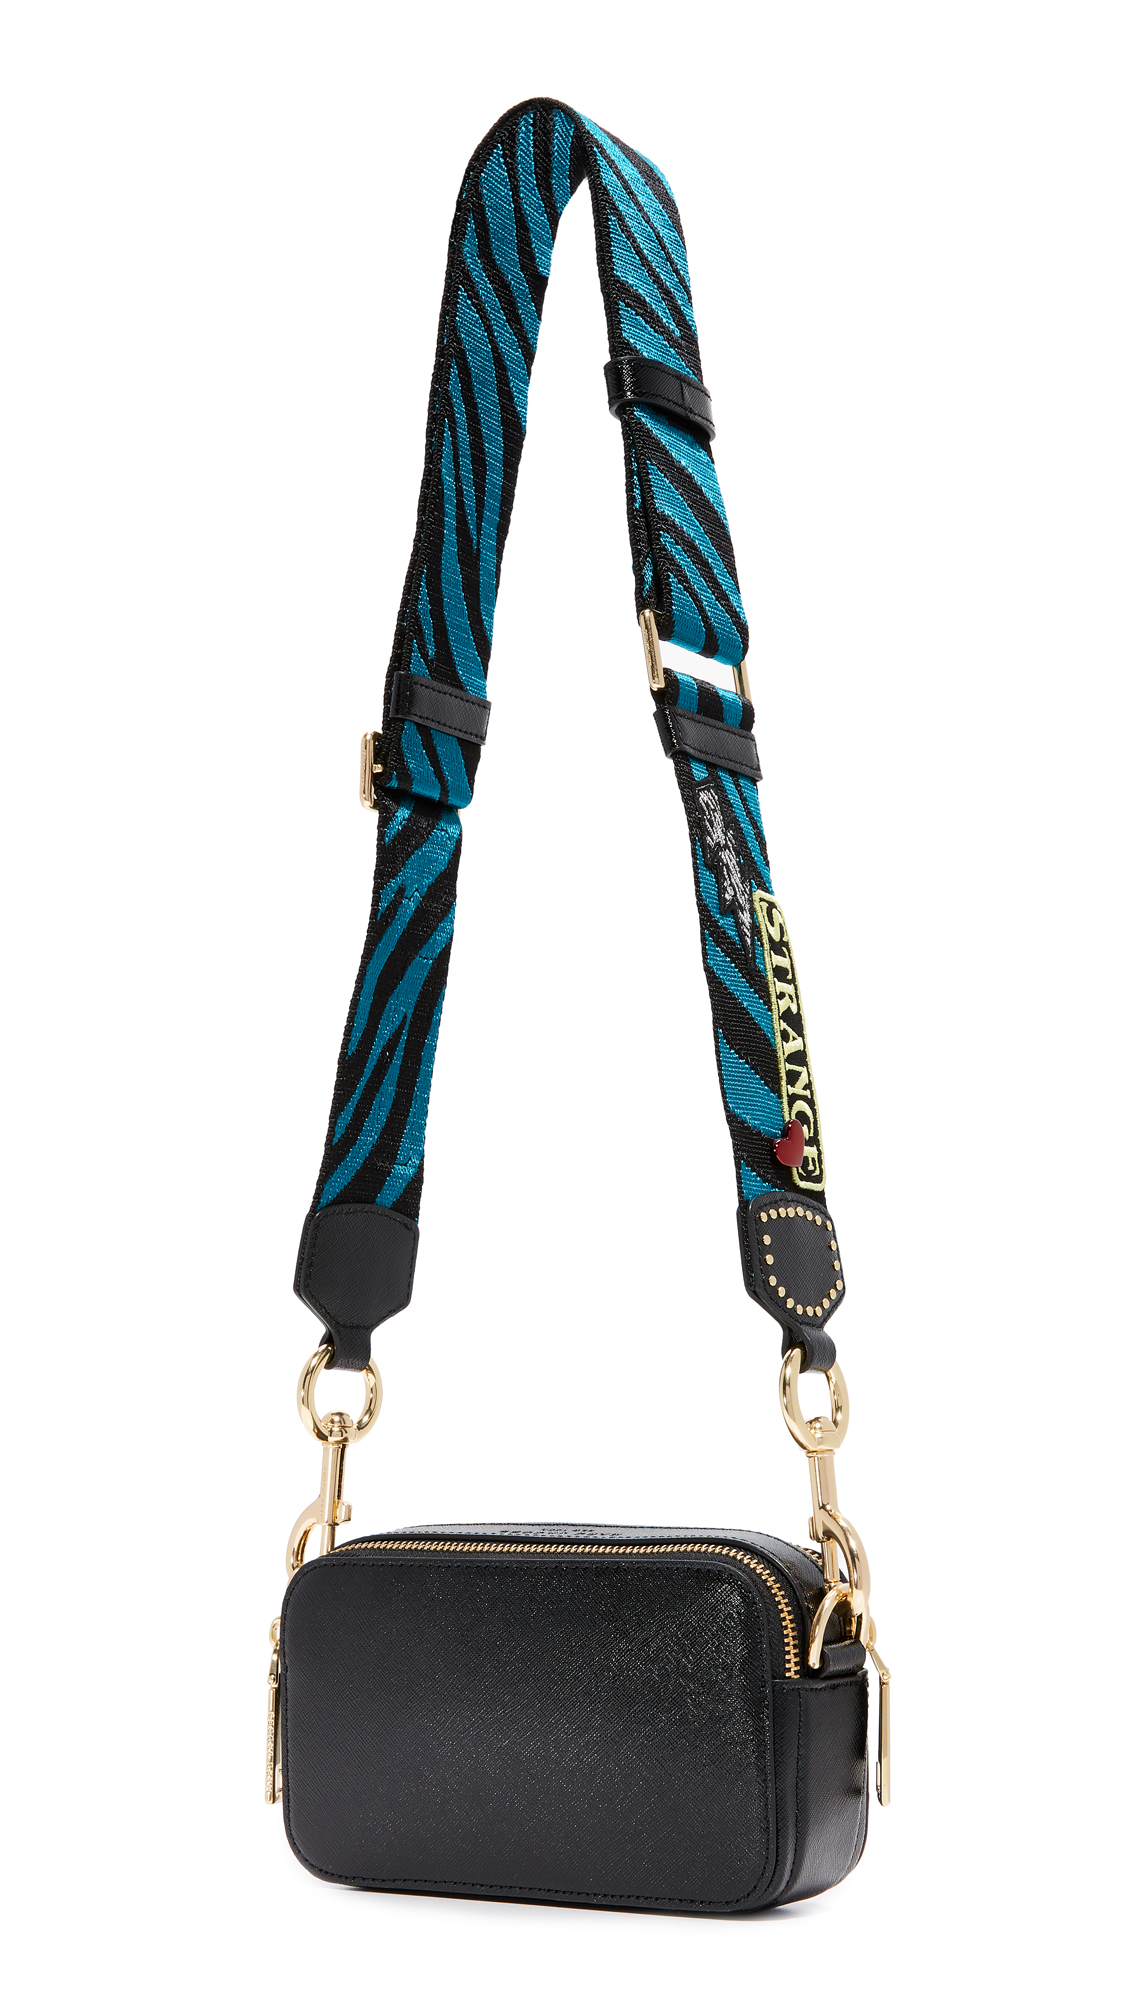 632b21616e61 Marc Jacobs Kaia Snapshot Bag